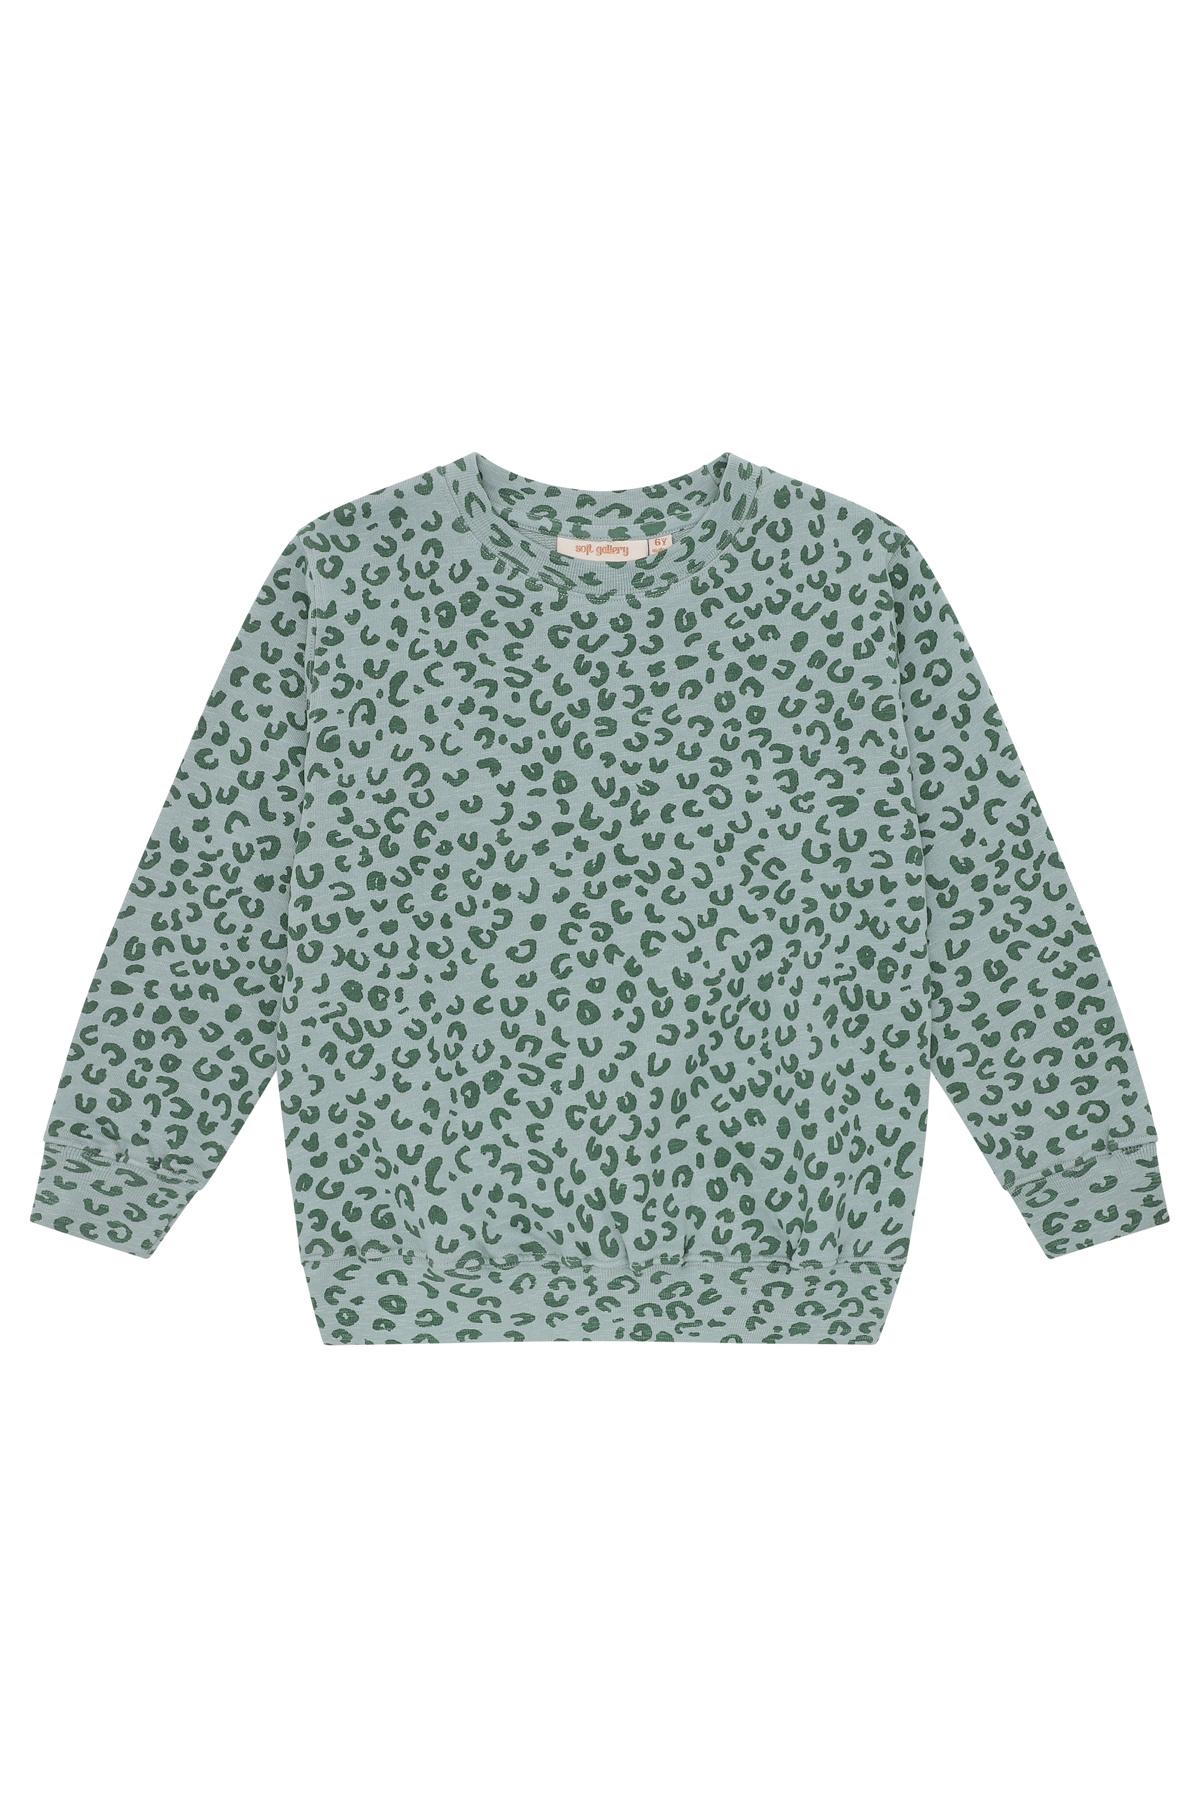 Baptiste sweatshirt - Slate Leopspot-1